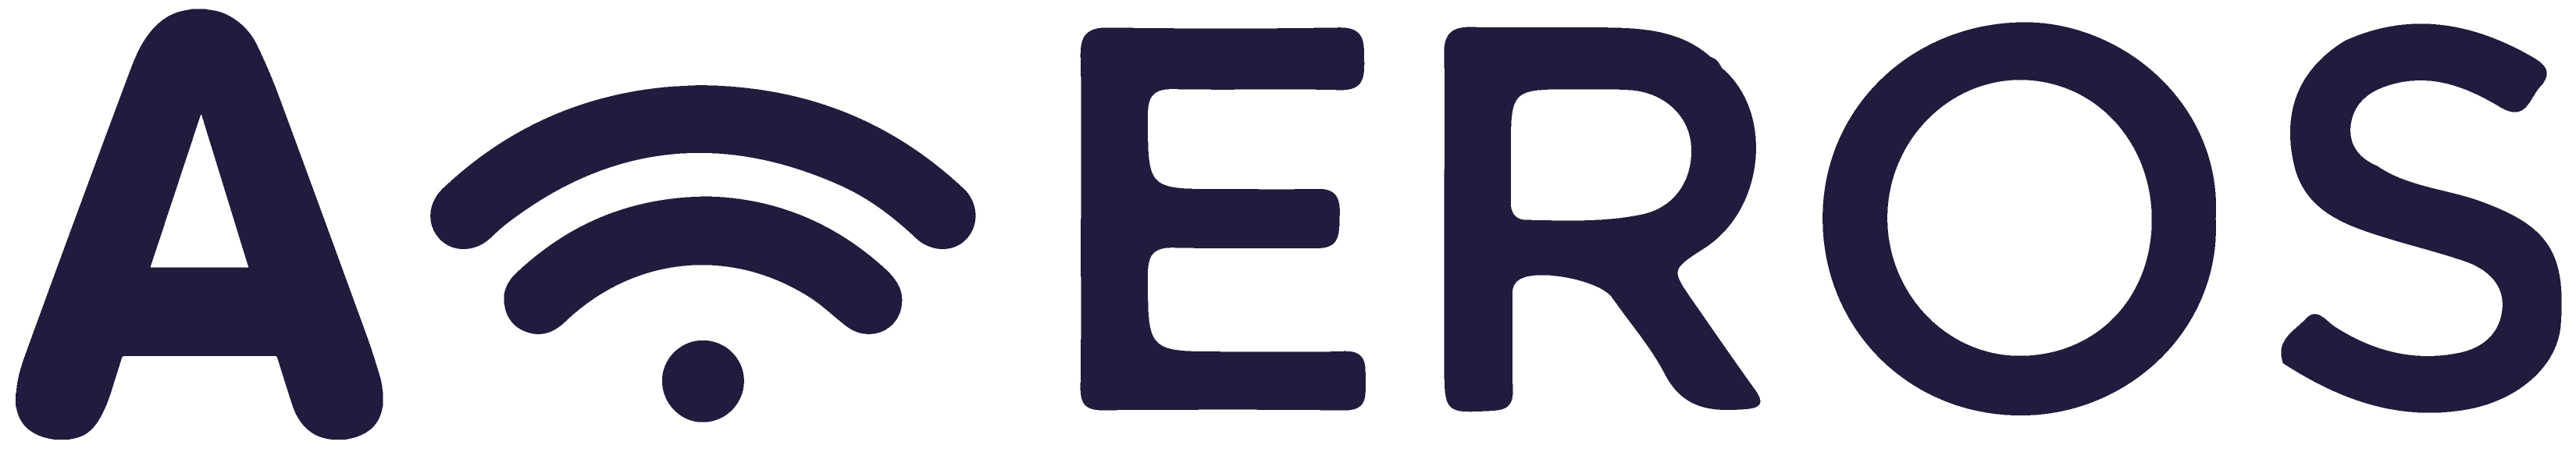 aeros-logo